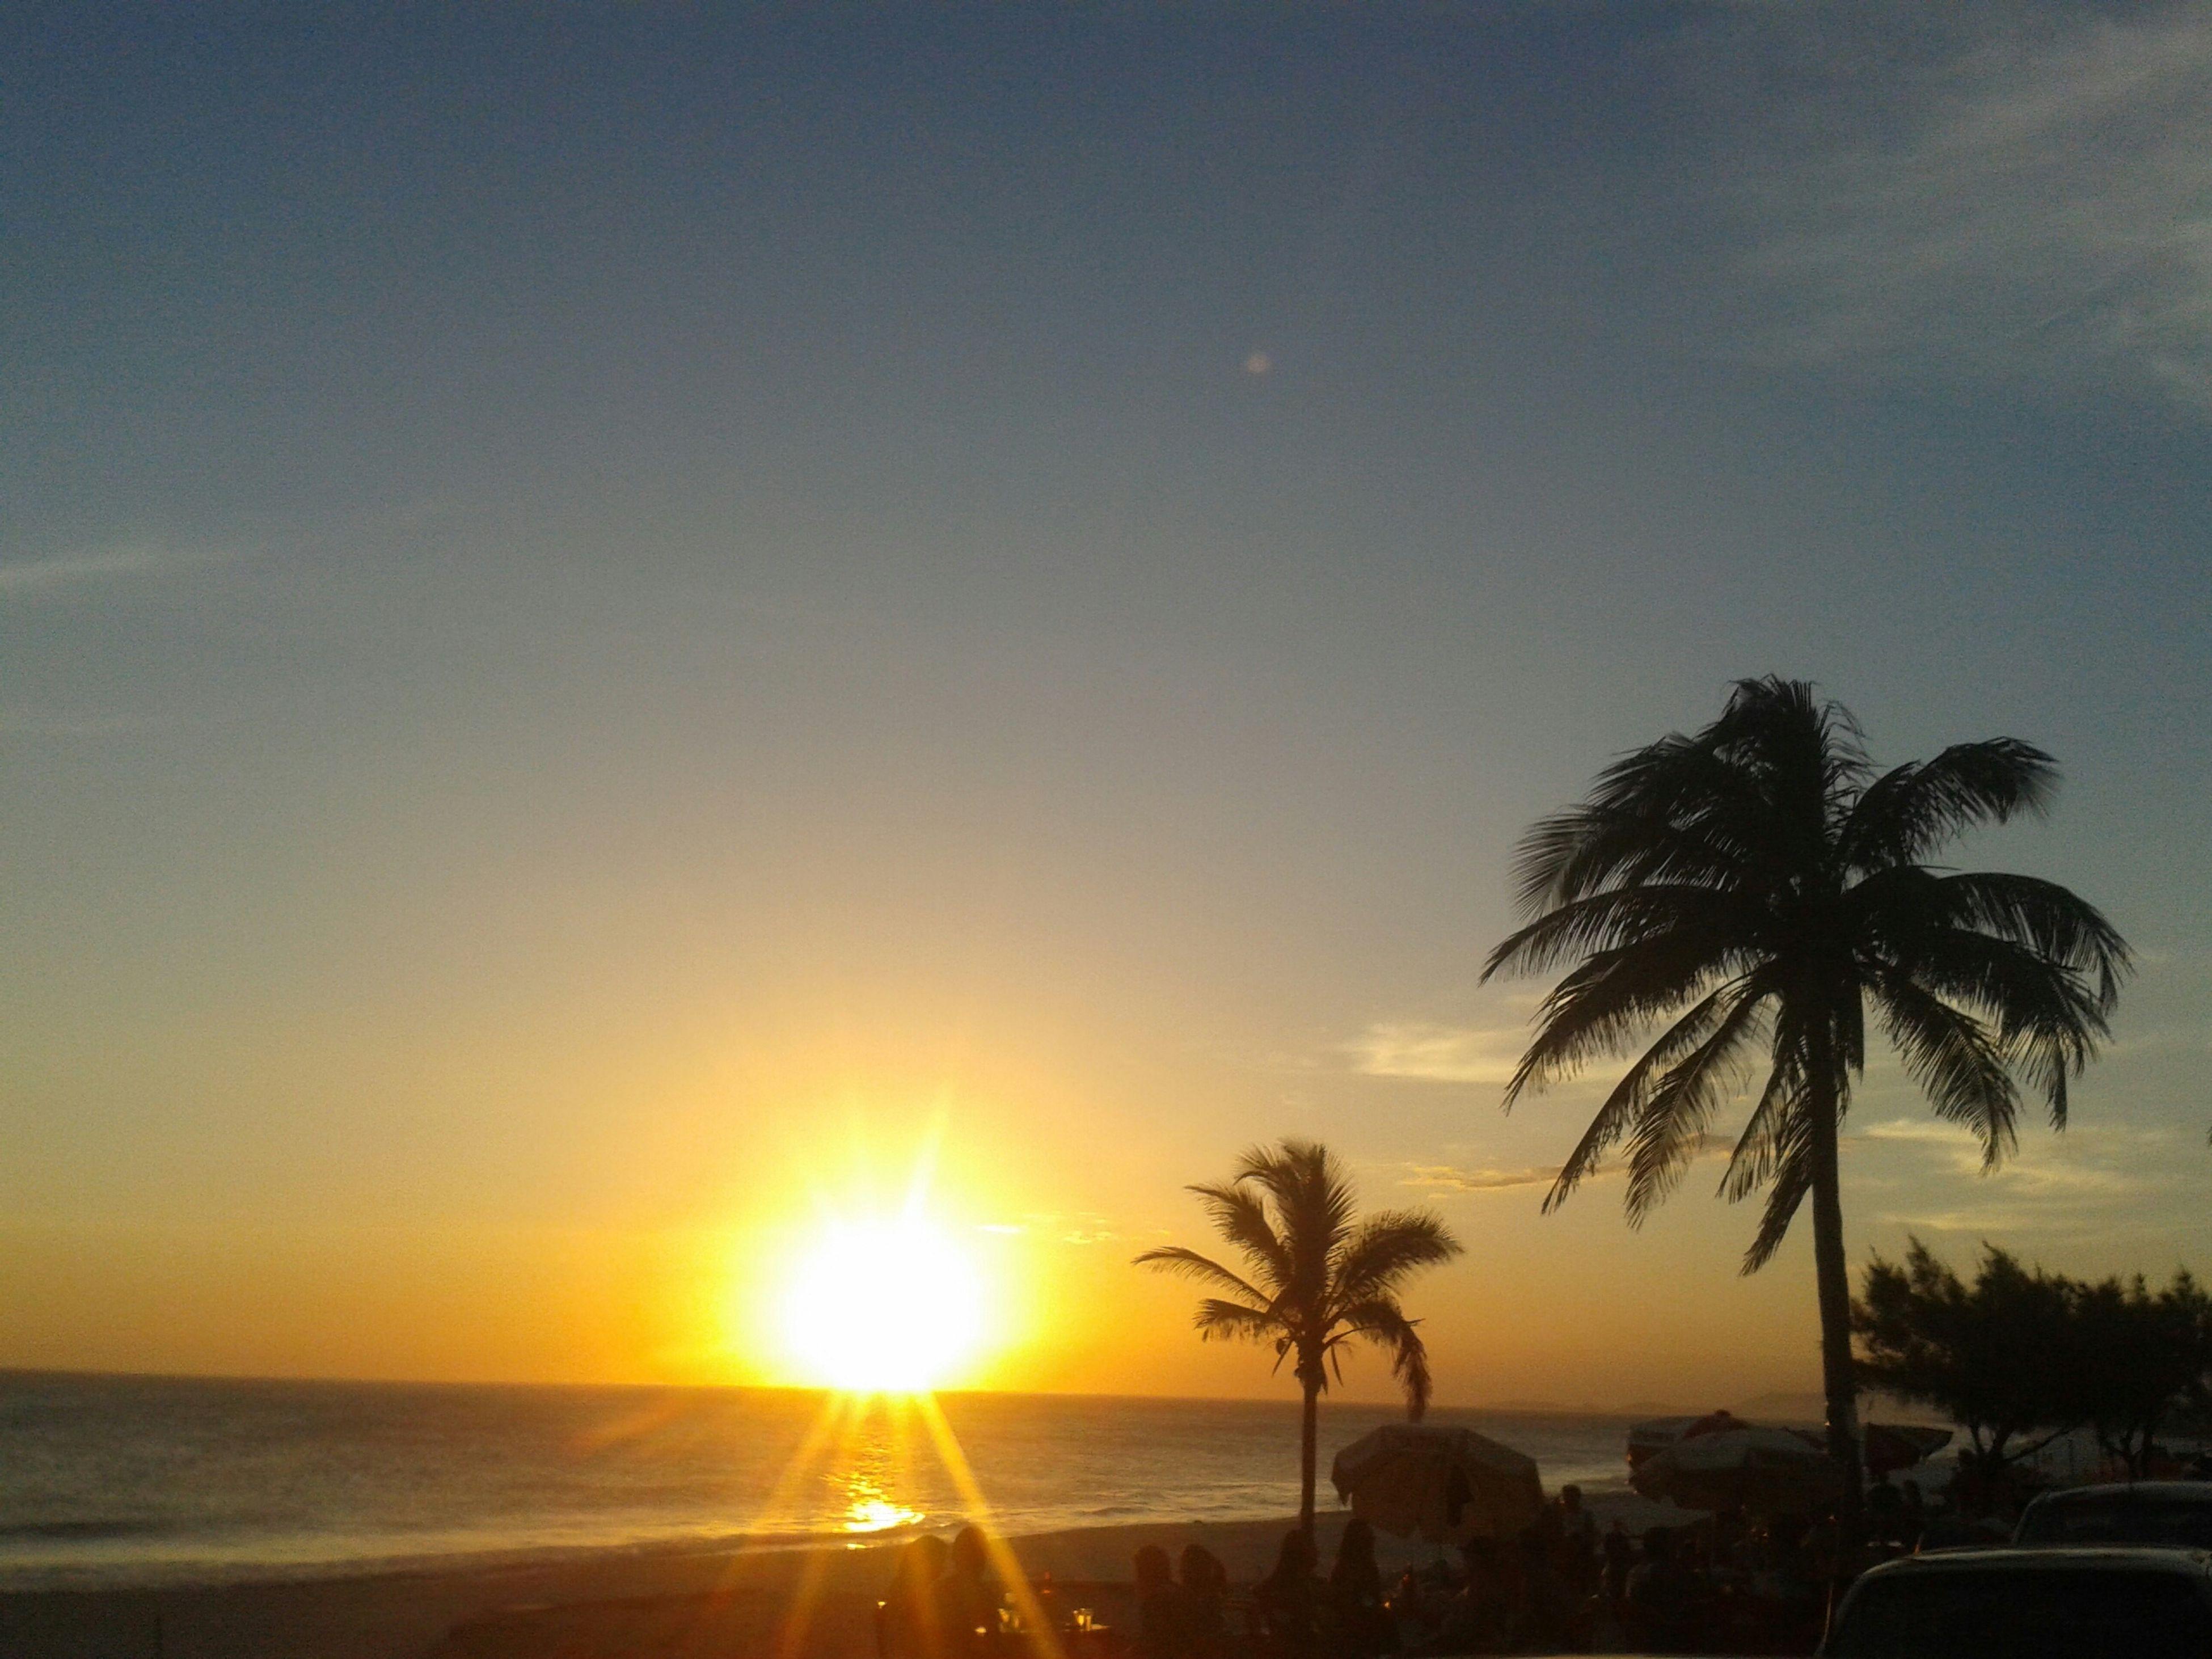 sunset, sun, sea, palm tree, scenics, tranquil scene, horizon over water, silhouette, water, beauty in nature, tranquility, tree, beach, nature, sunlight, orange color, clear sky, sky, idyllic, sunbeam